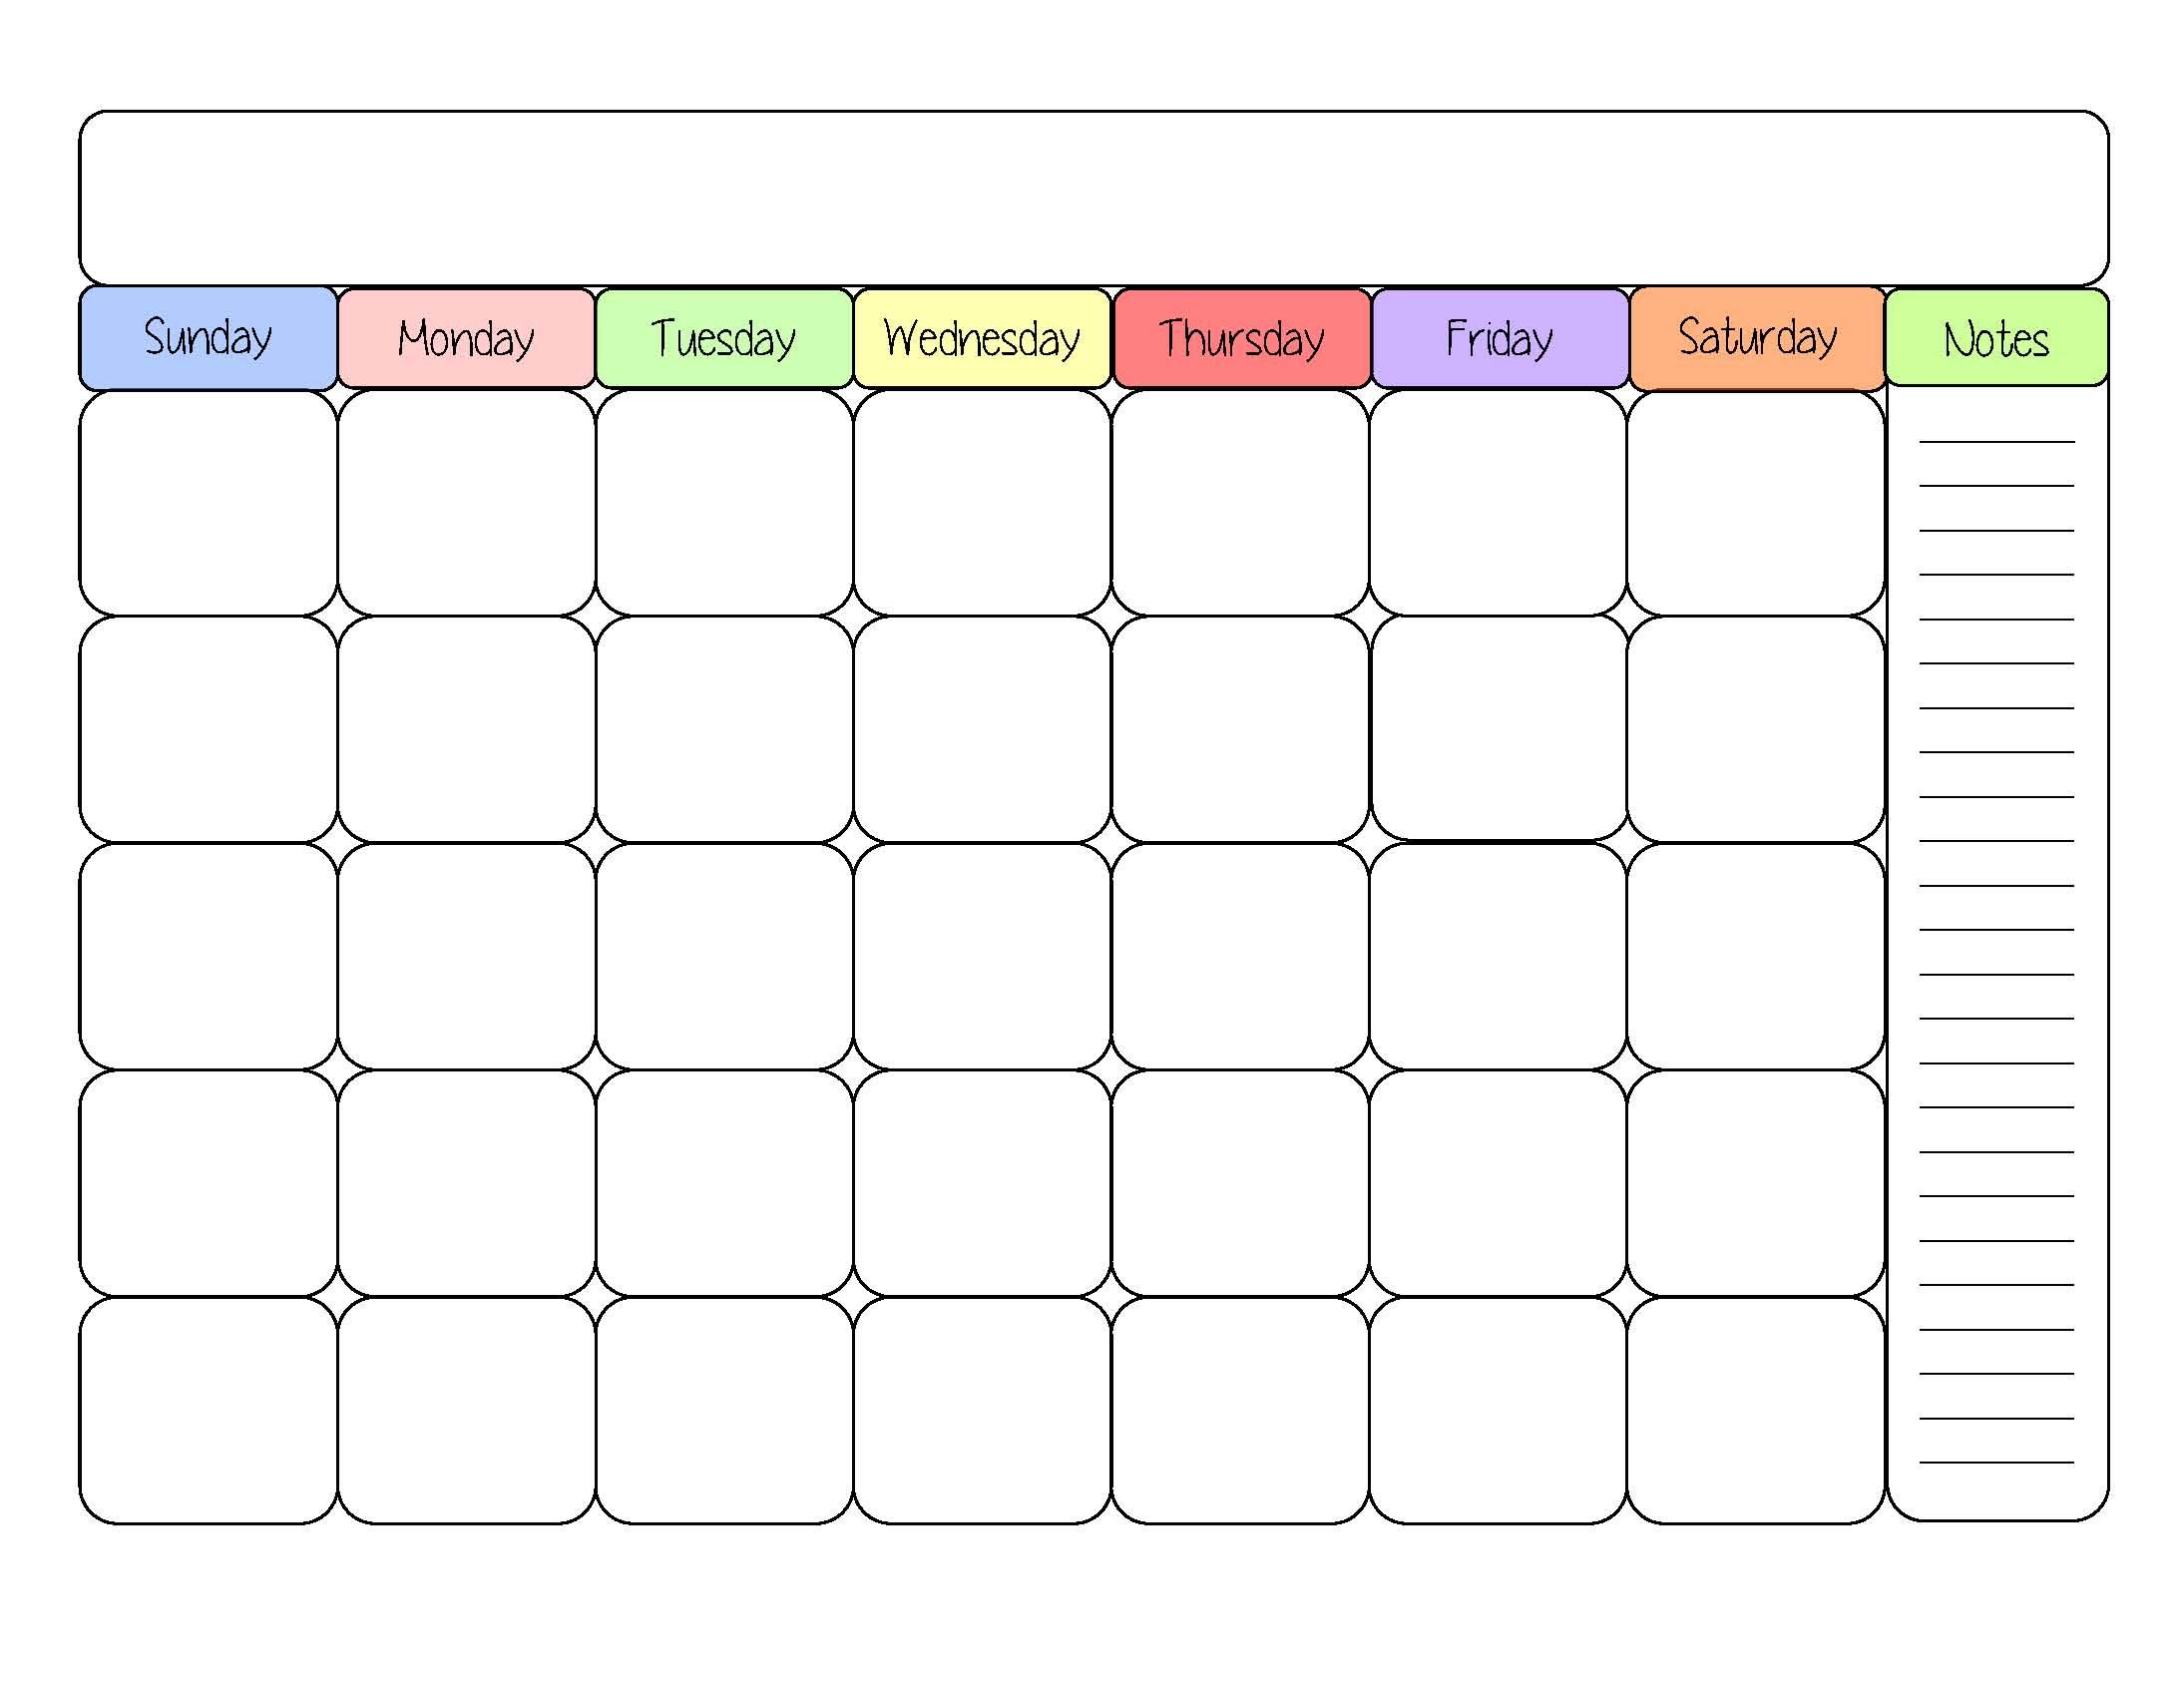 Calendar Template To Print   printable calendar templates